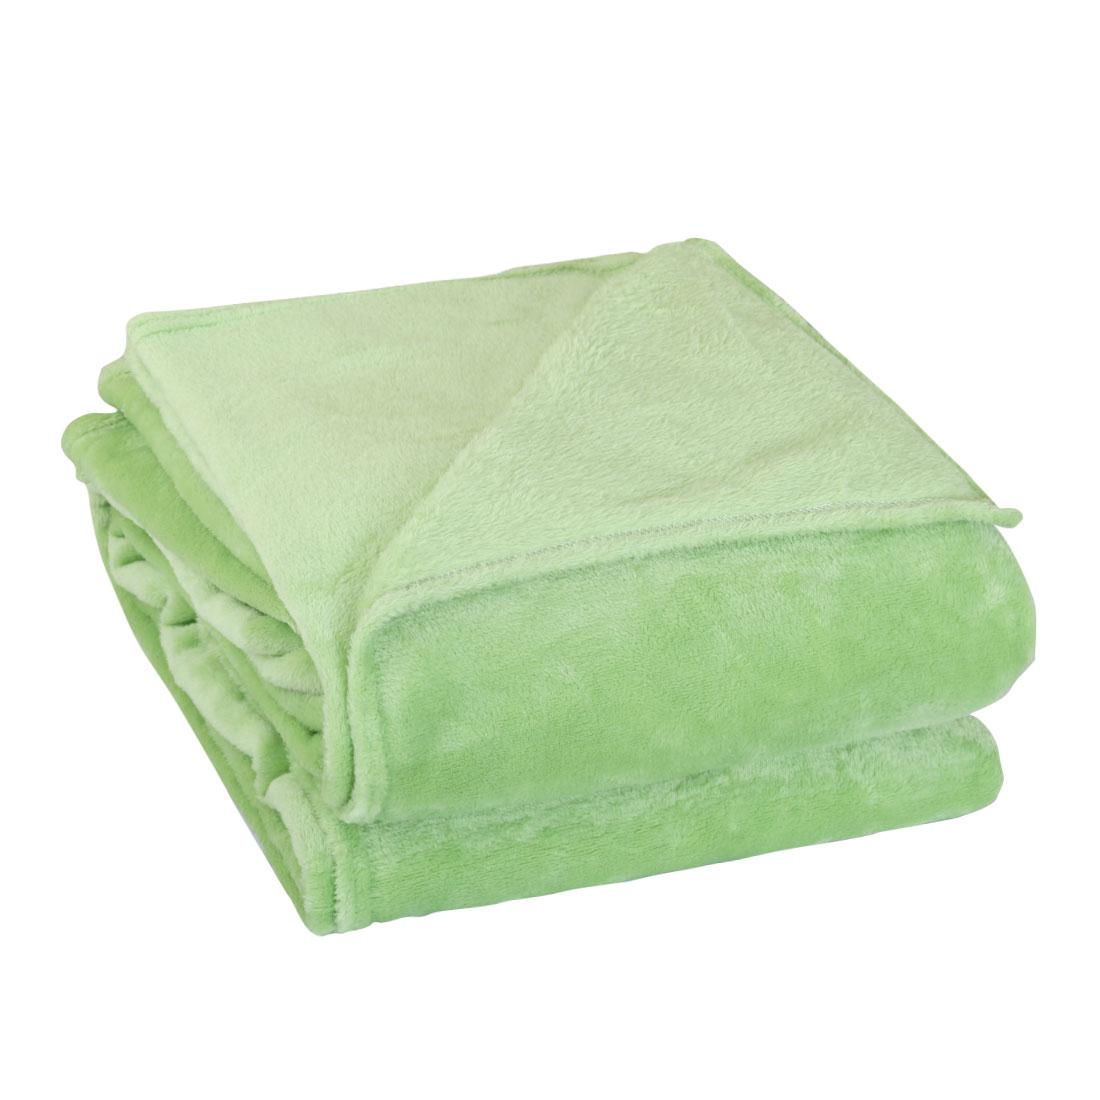 230 x 250cm Home Bedroom Warm Throw Blanket Rug Plush Fleece Bed Quilt Sofa Soft Pure Light Green